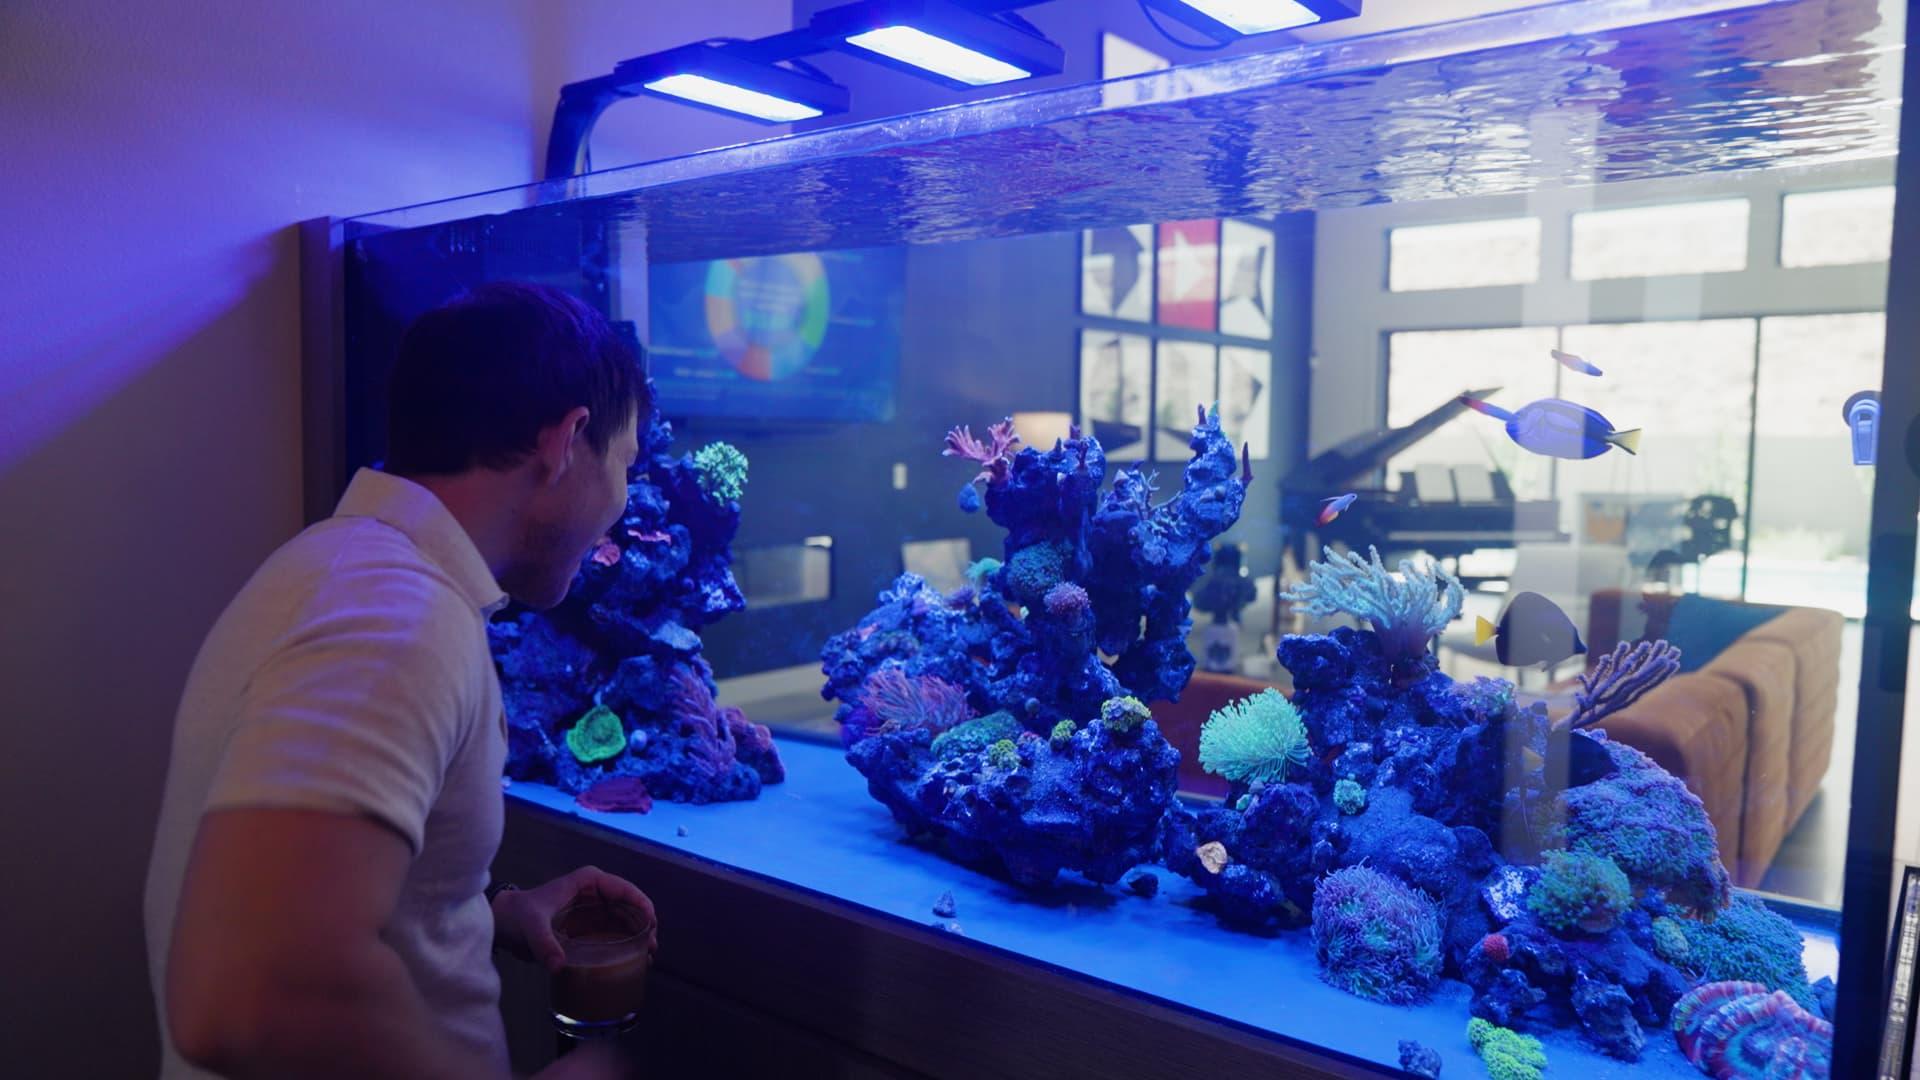 Graham Stephan has spent $45,000 building out his dream aquarium.